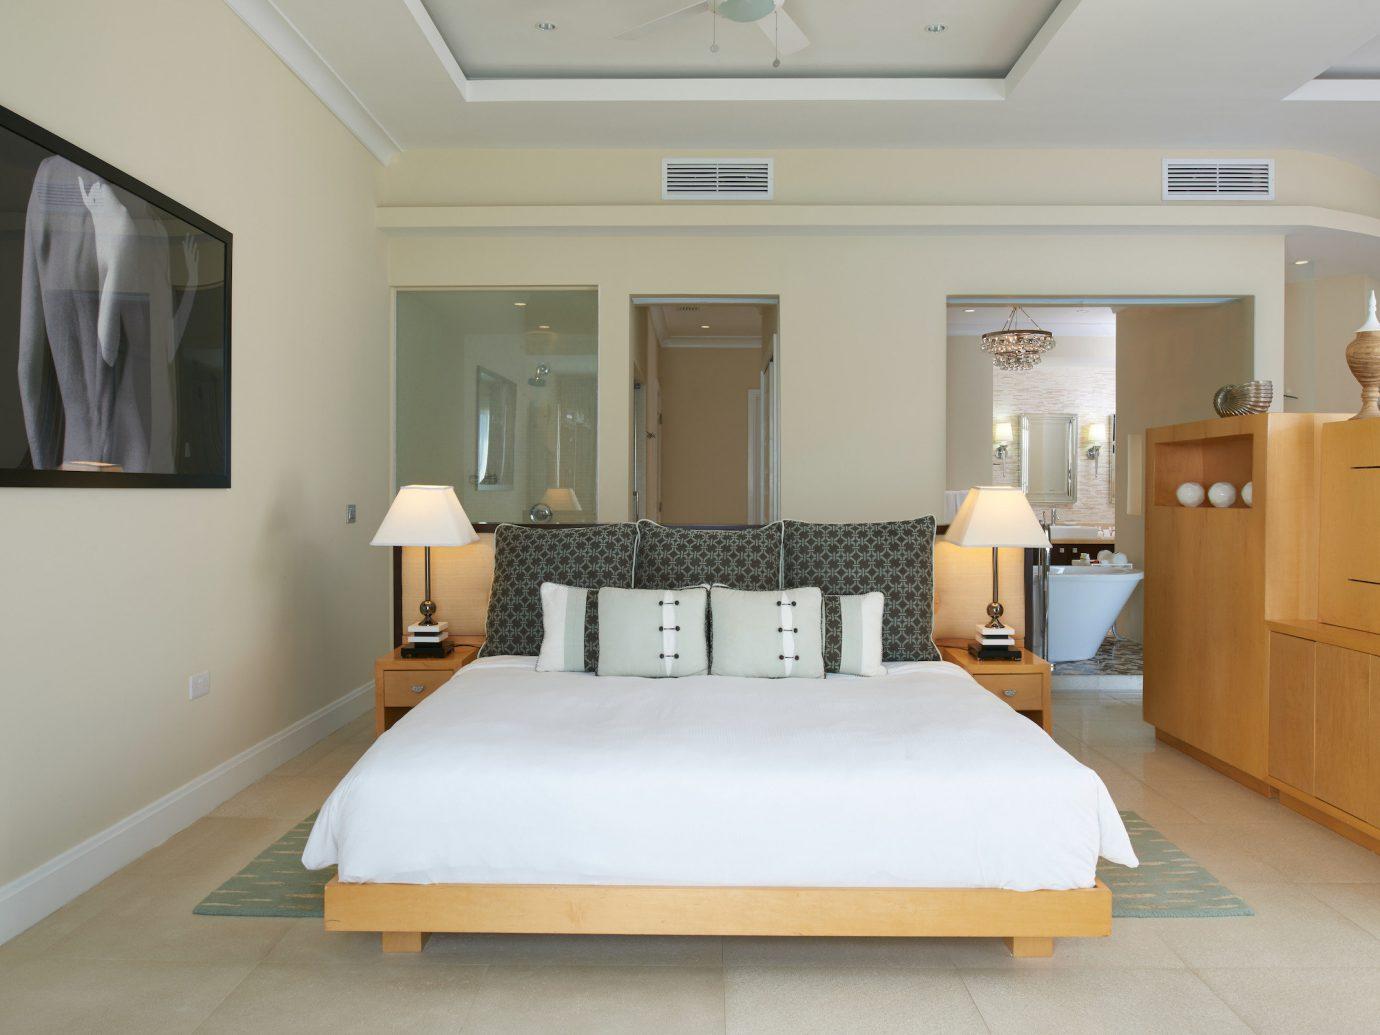 All-Inclusive Resorts Hotels Luxury Travel Solo Travel floor indoor wall room bed frame Bedroom interior design ceiling bed furniture Suite real estate mattress bed sheet estate interior designer